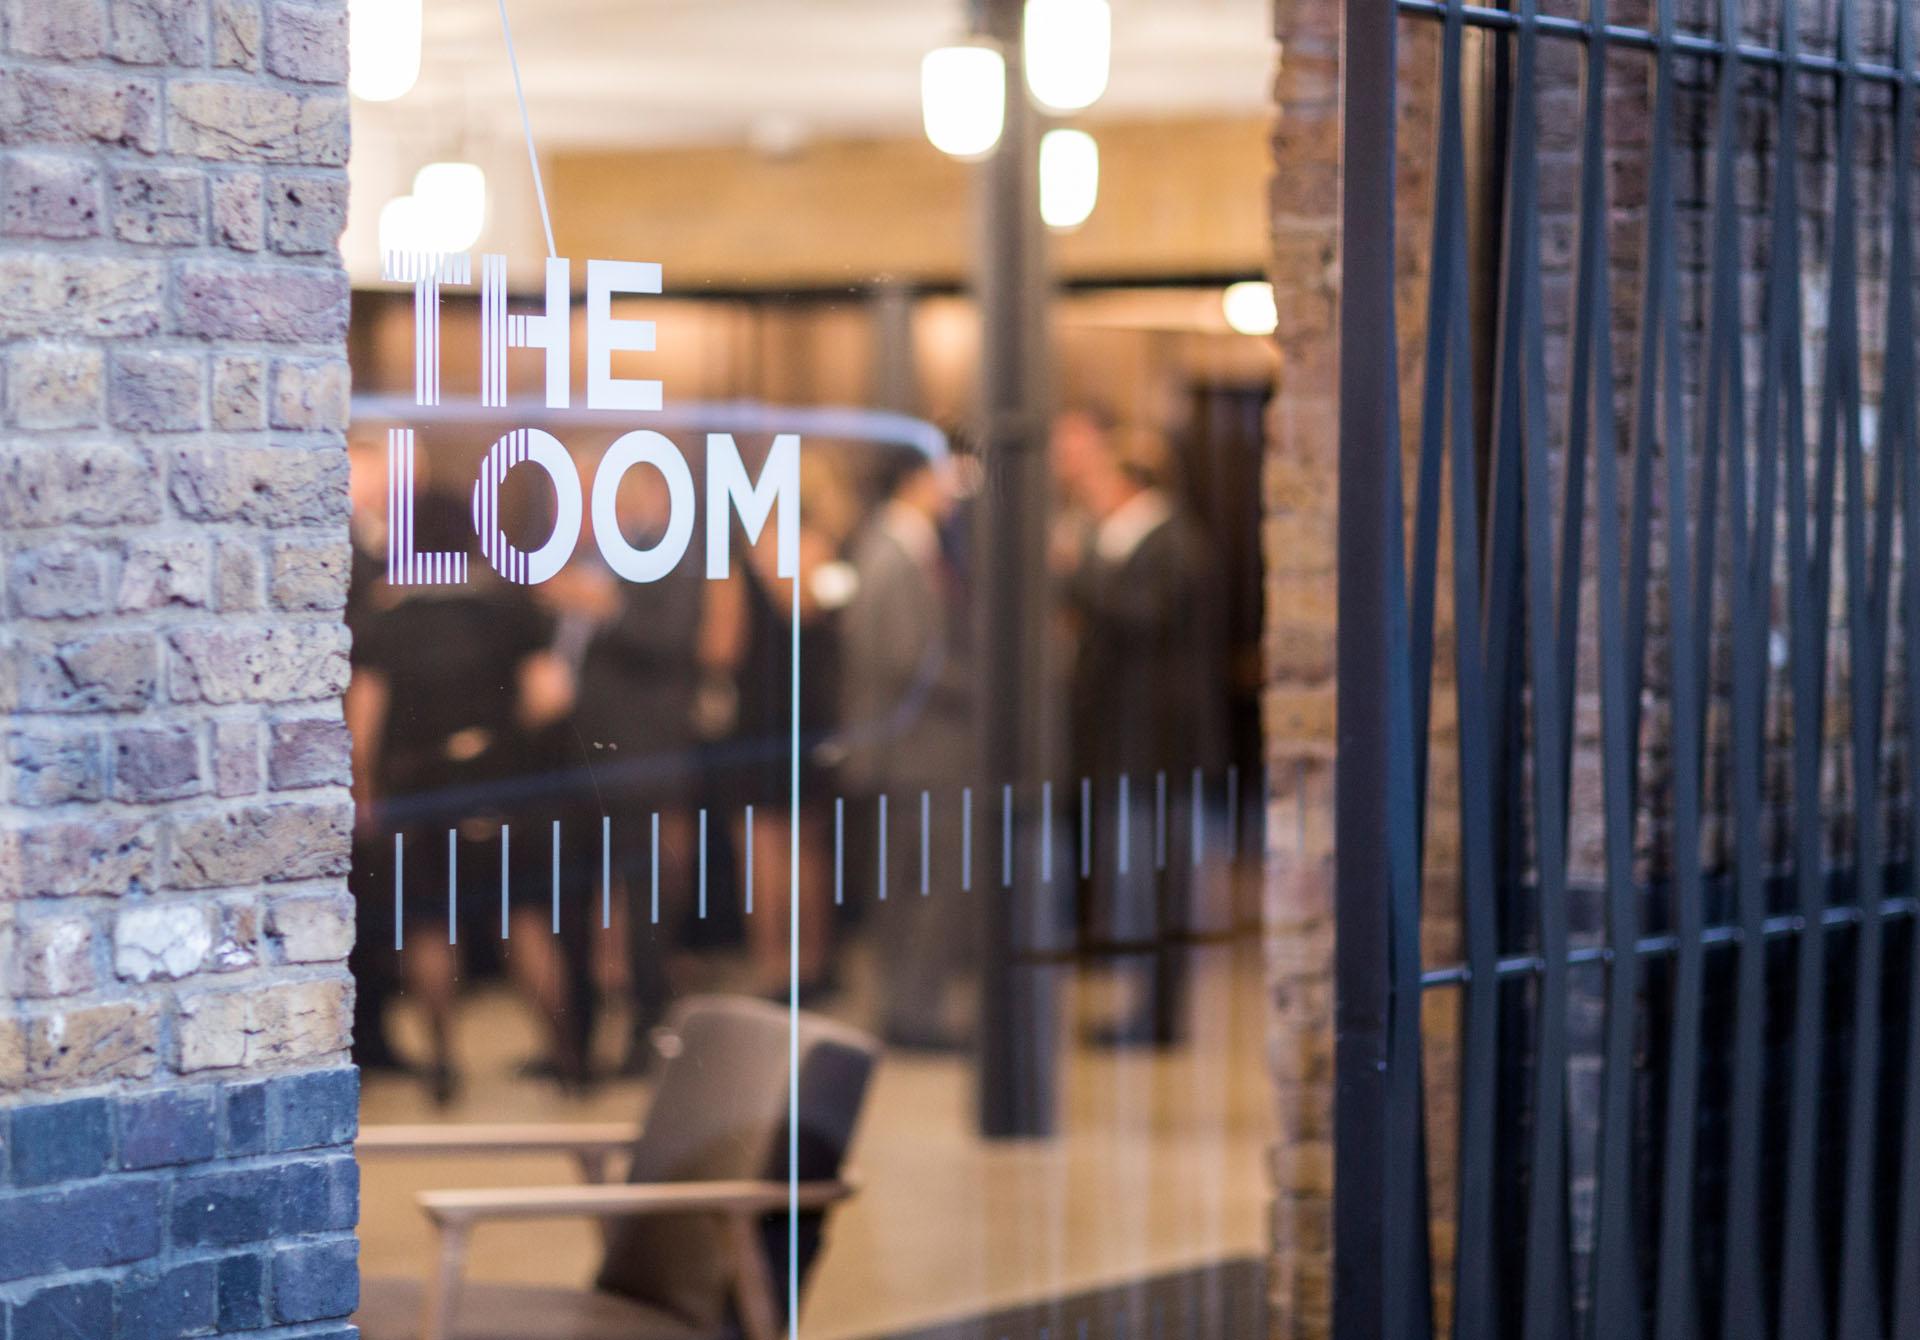 10-The Loom